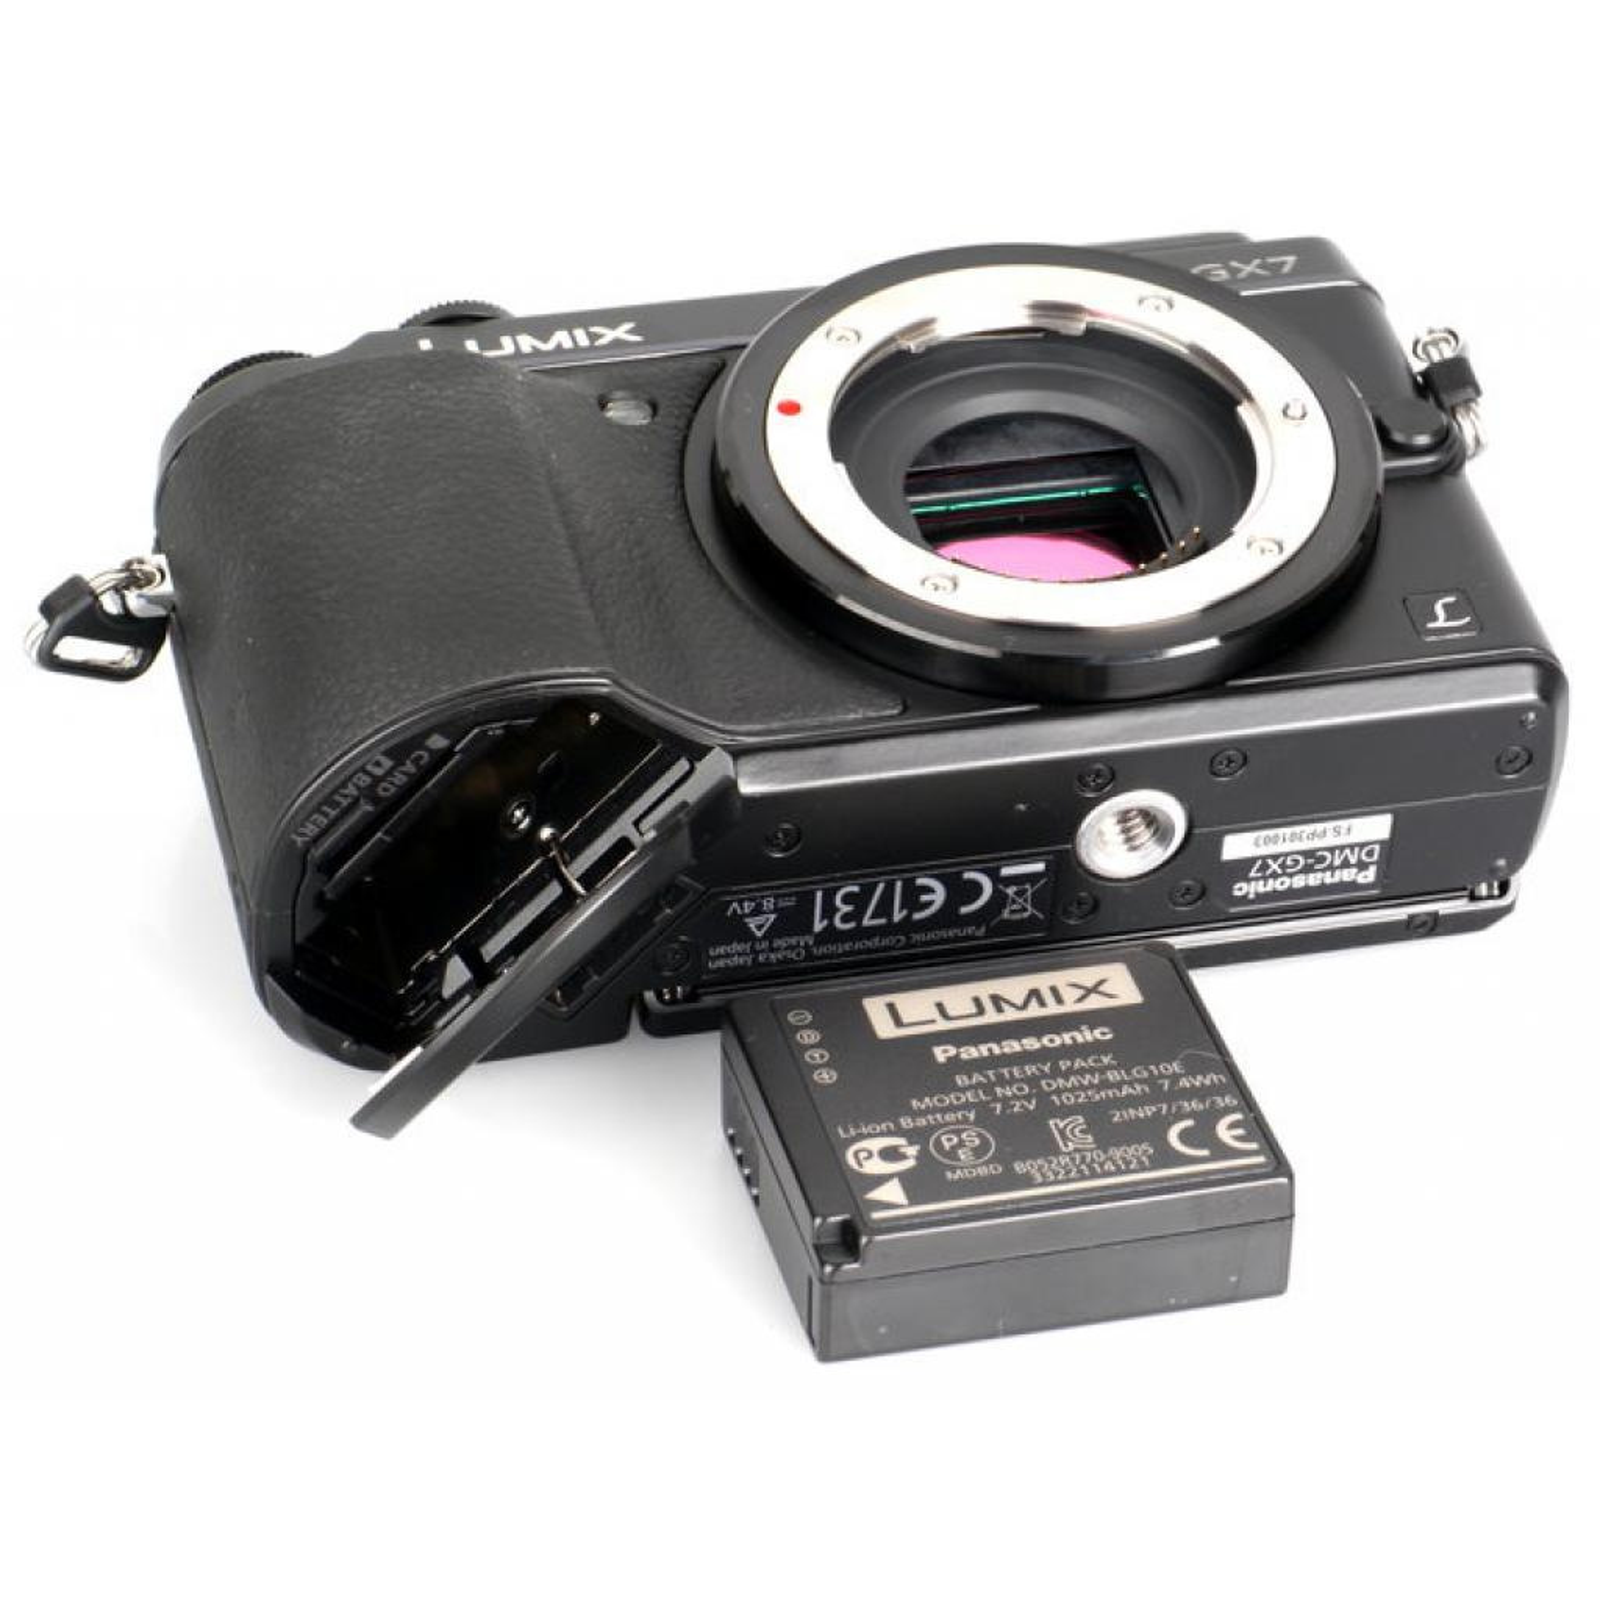 Цифровой фотоаппарат PANASONIC DMC-GX7 Body (DMC-GX7EE-K) изображение 7